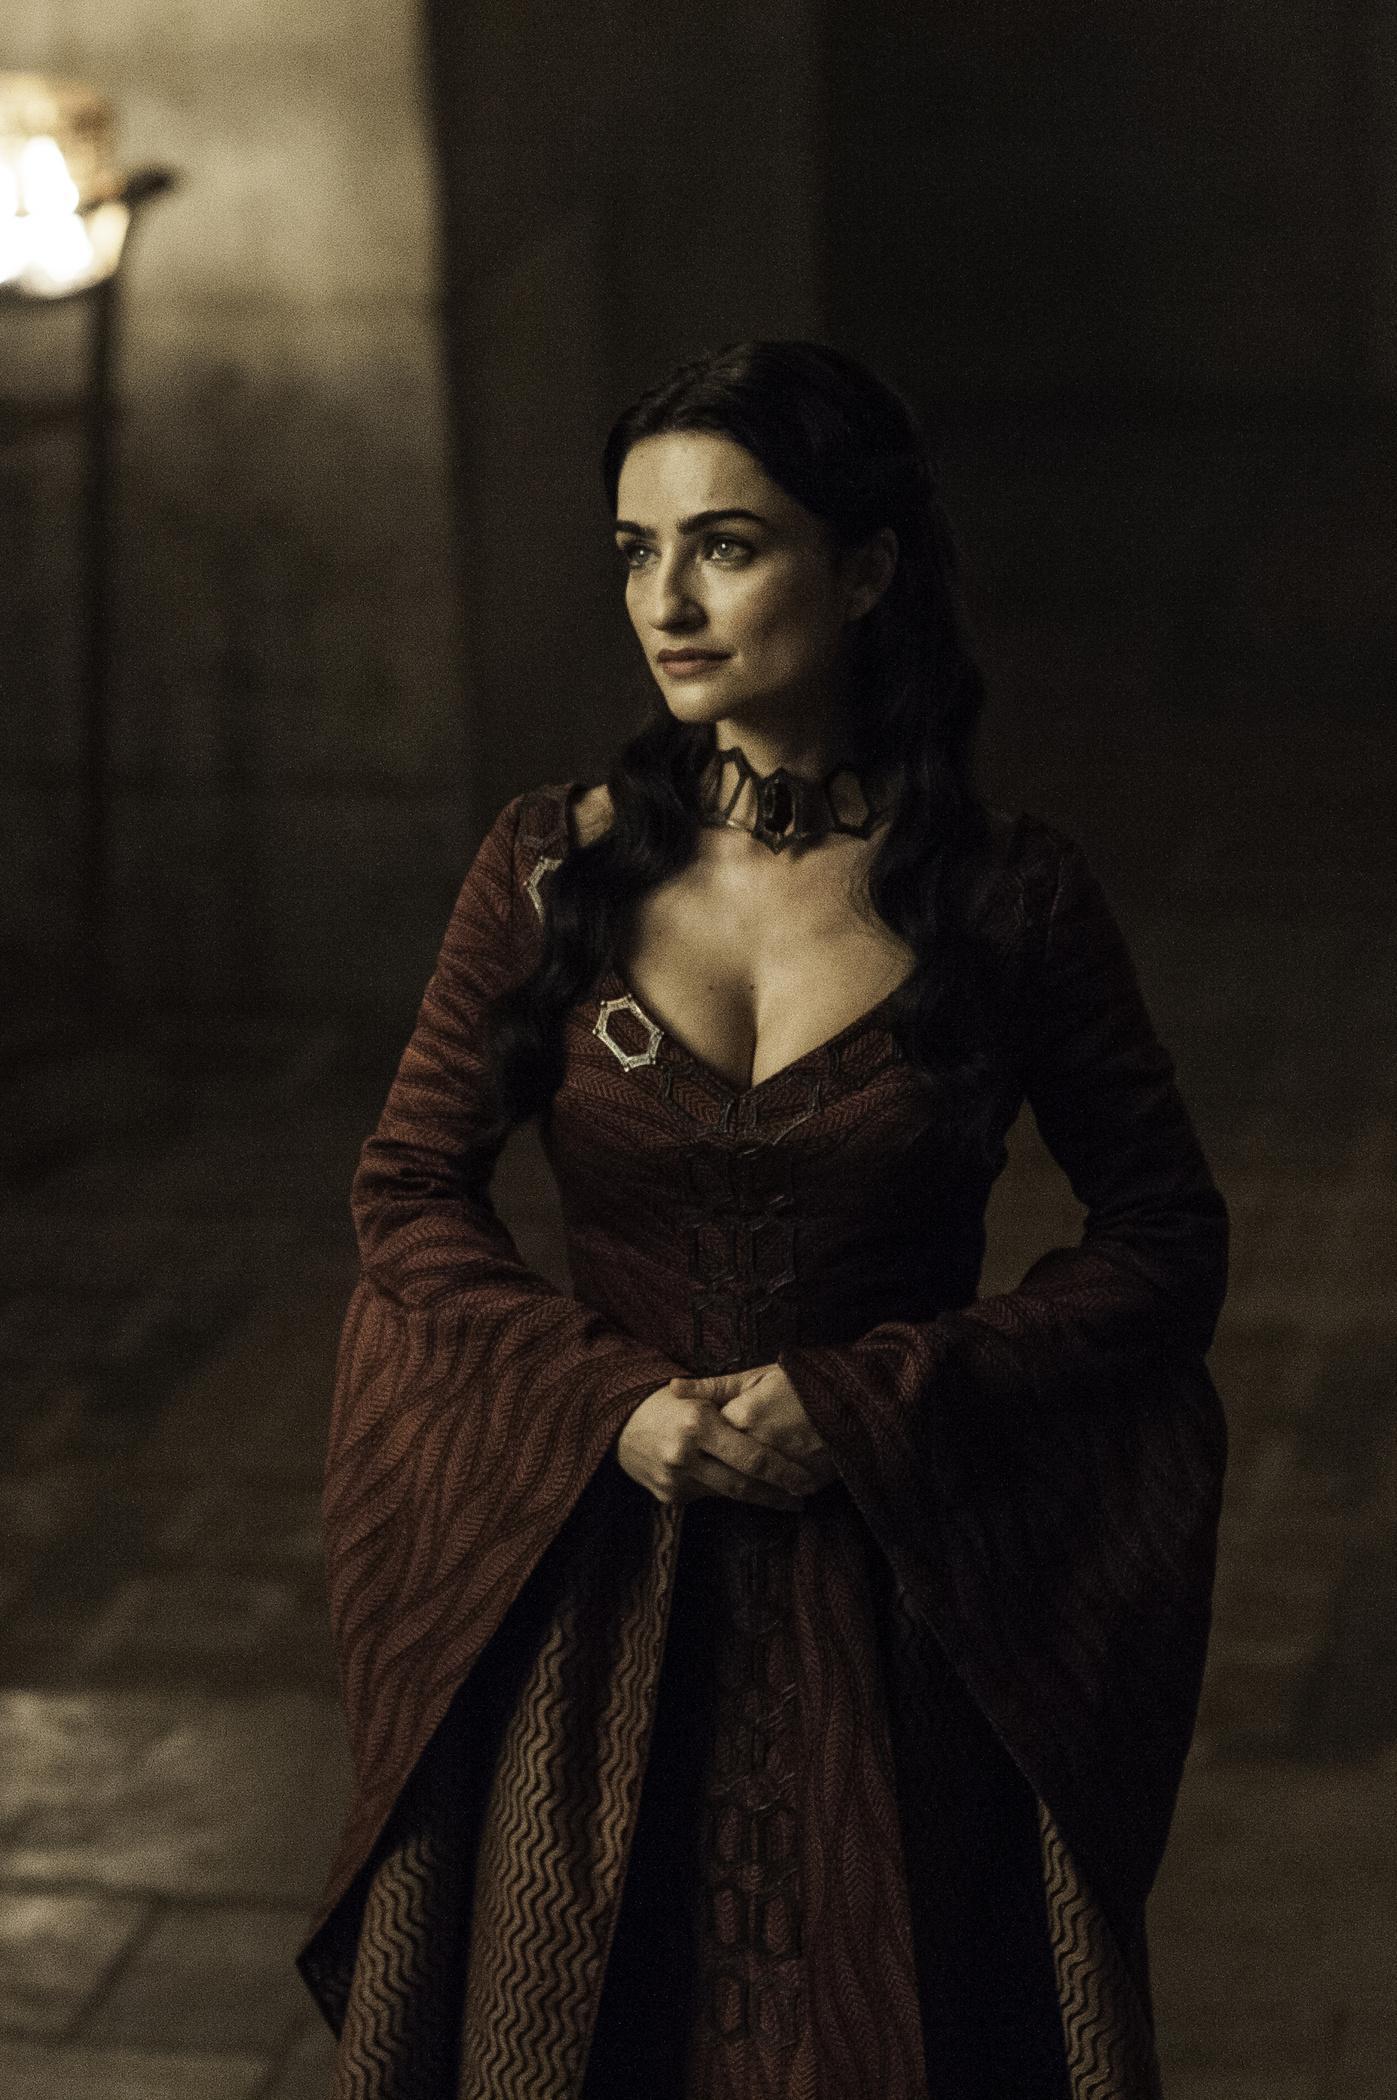 Photo: Ania Bukstein as Kinvara Credit: Helen Sloan/HBO